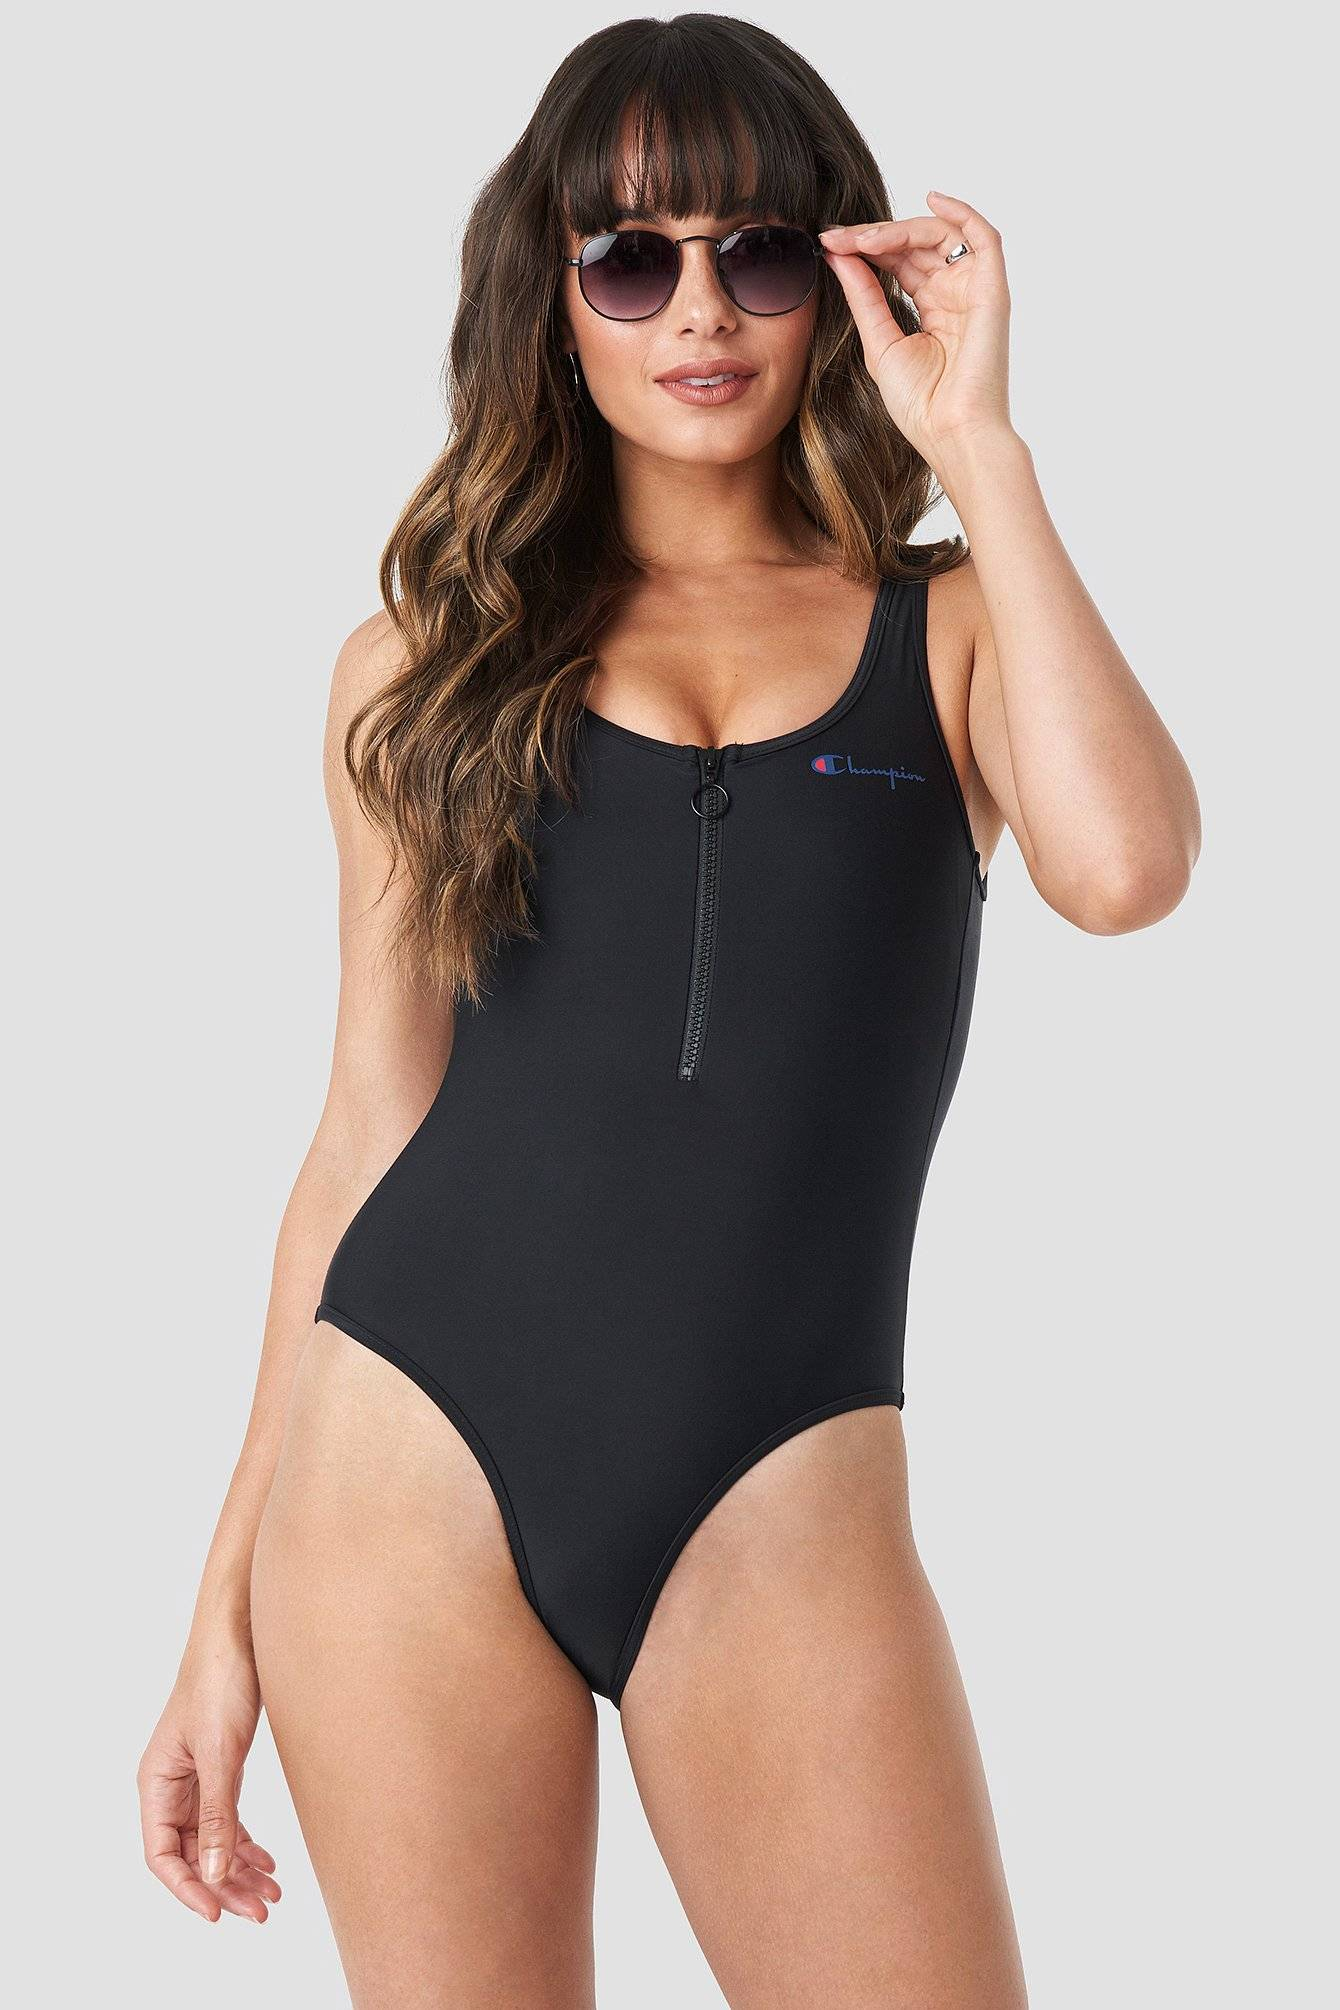 Champion Zipper Swimsuit - Black  - Size: Small